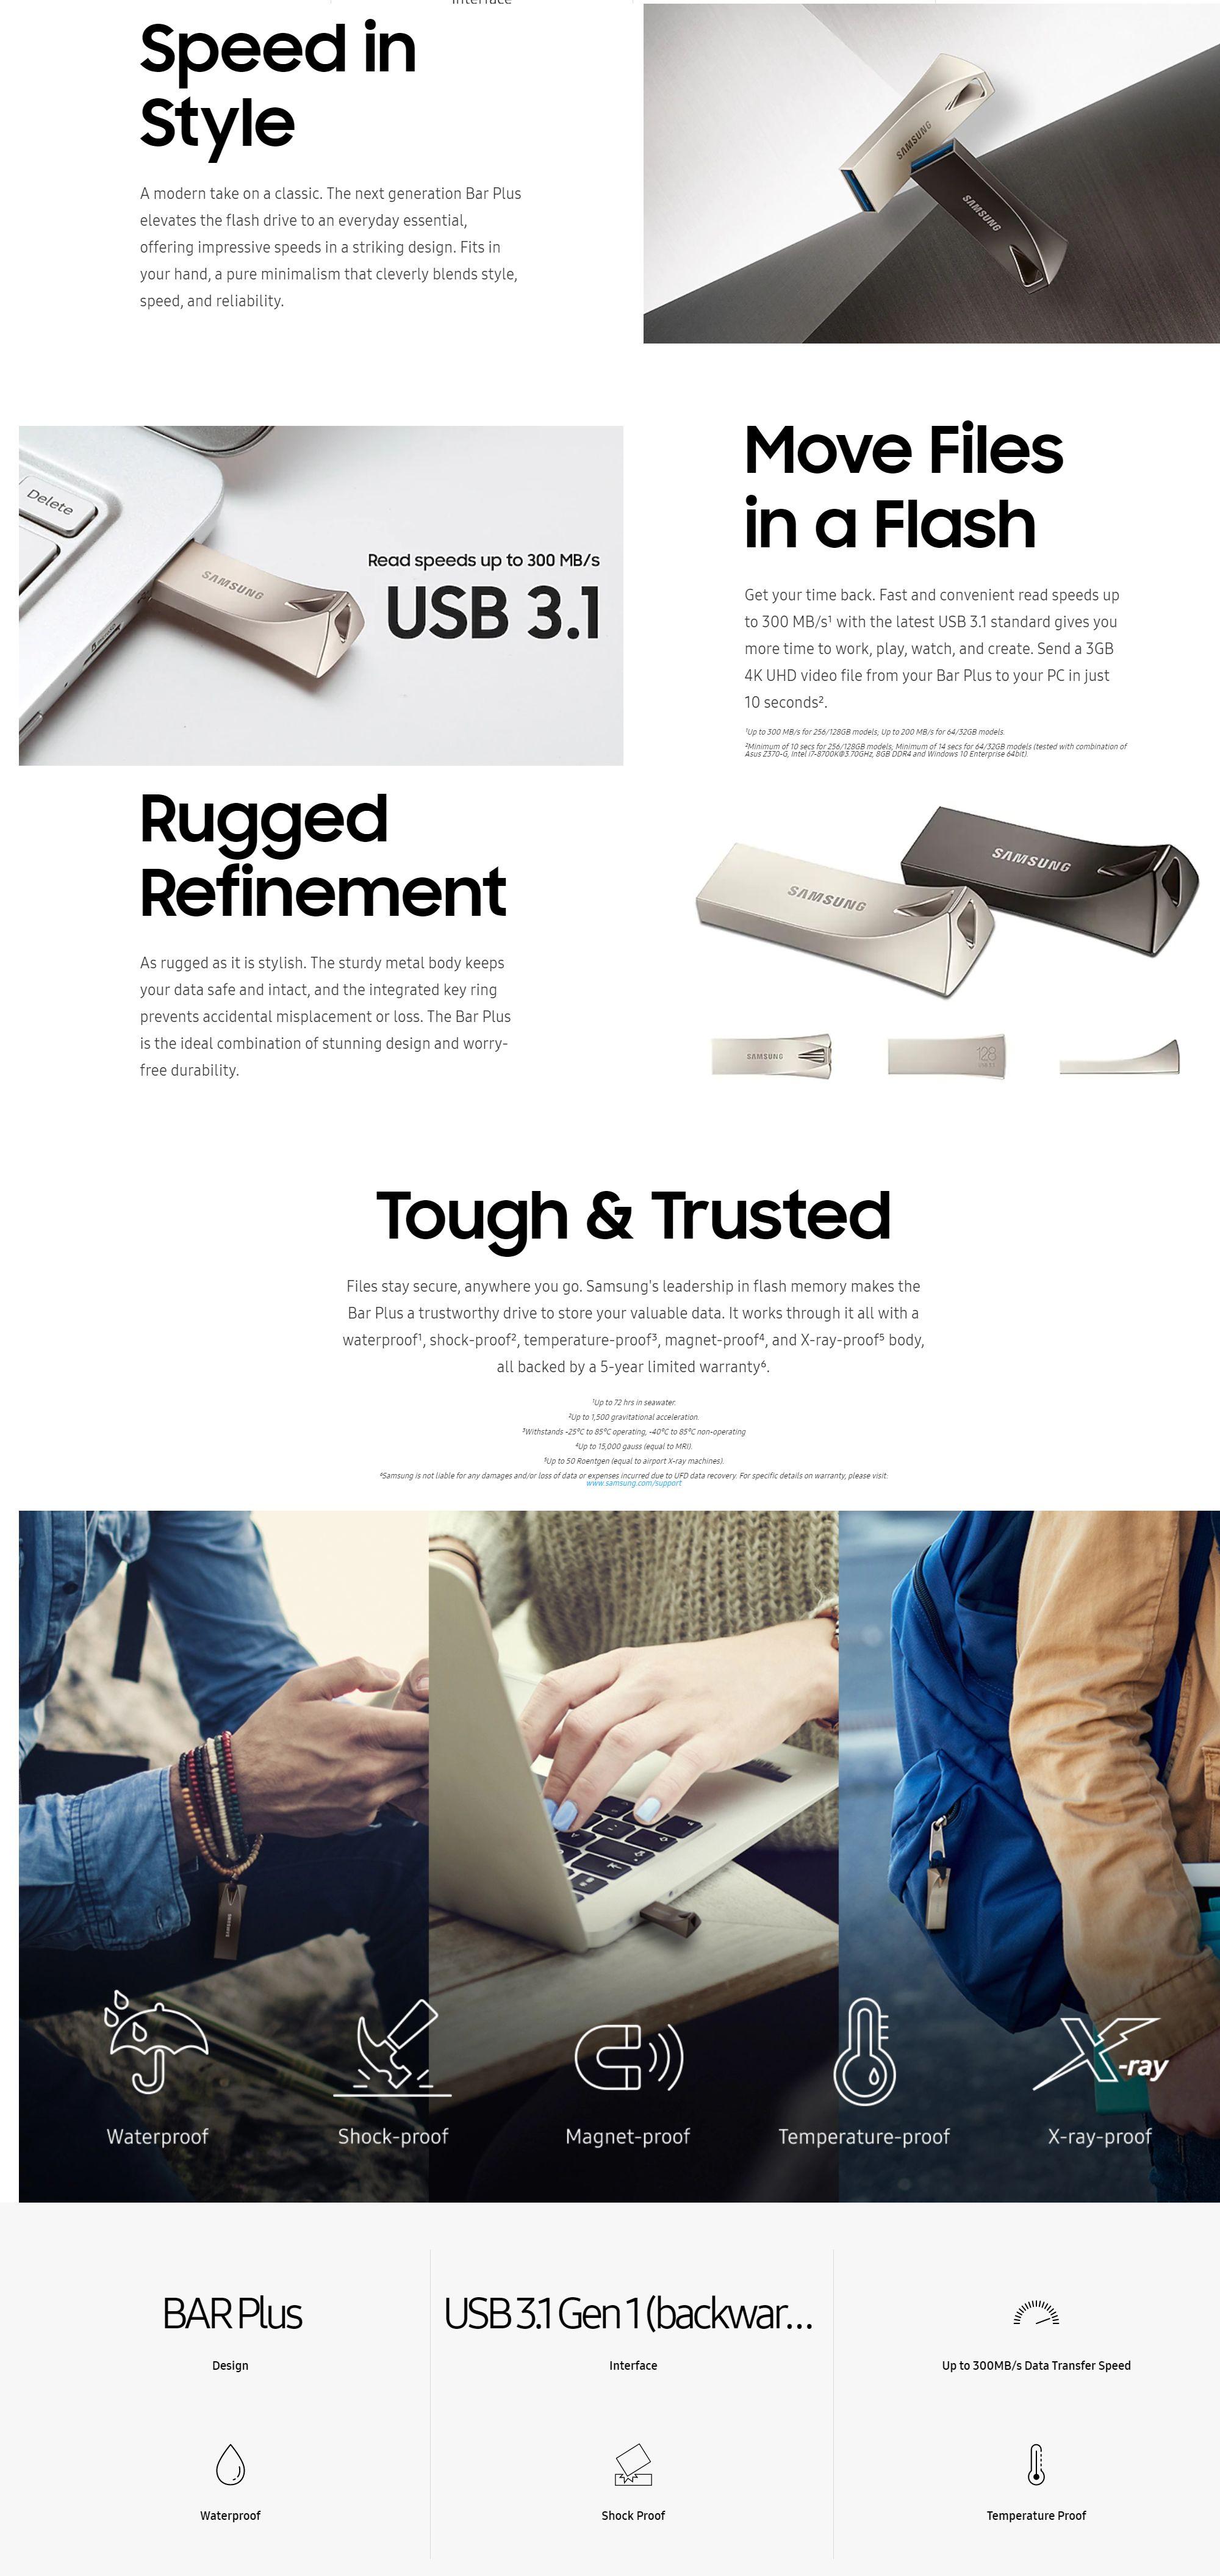 #1568 - 'USB 3_1 Flash Drive BAR Plus 128GB Champagne Silver Memory & Storage - MUF-128BE3_AM I Samsung US' - www_samsung_com.jpg